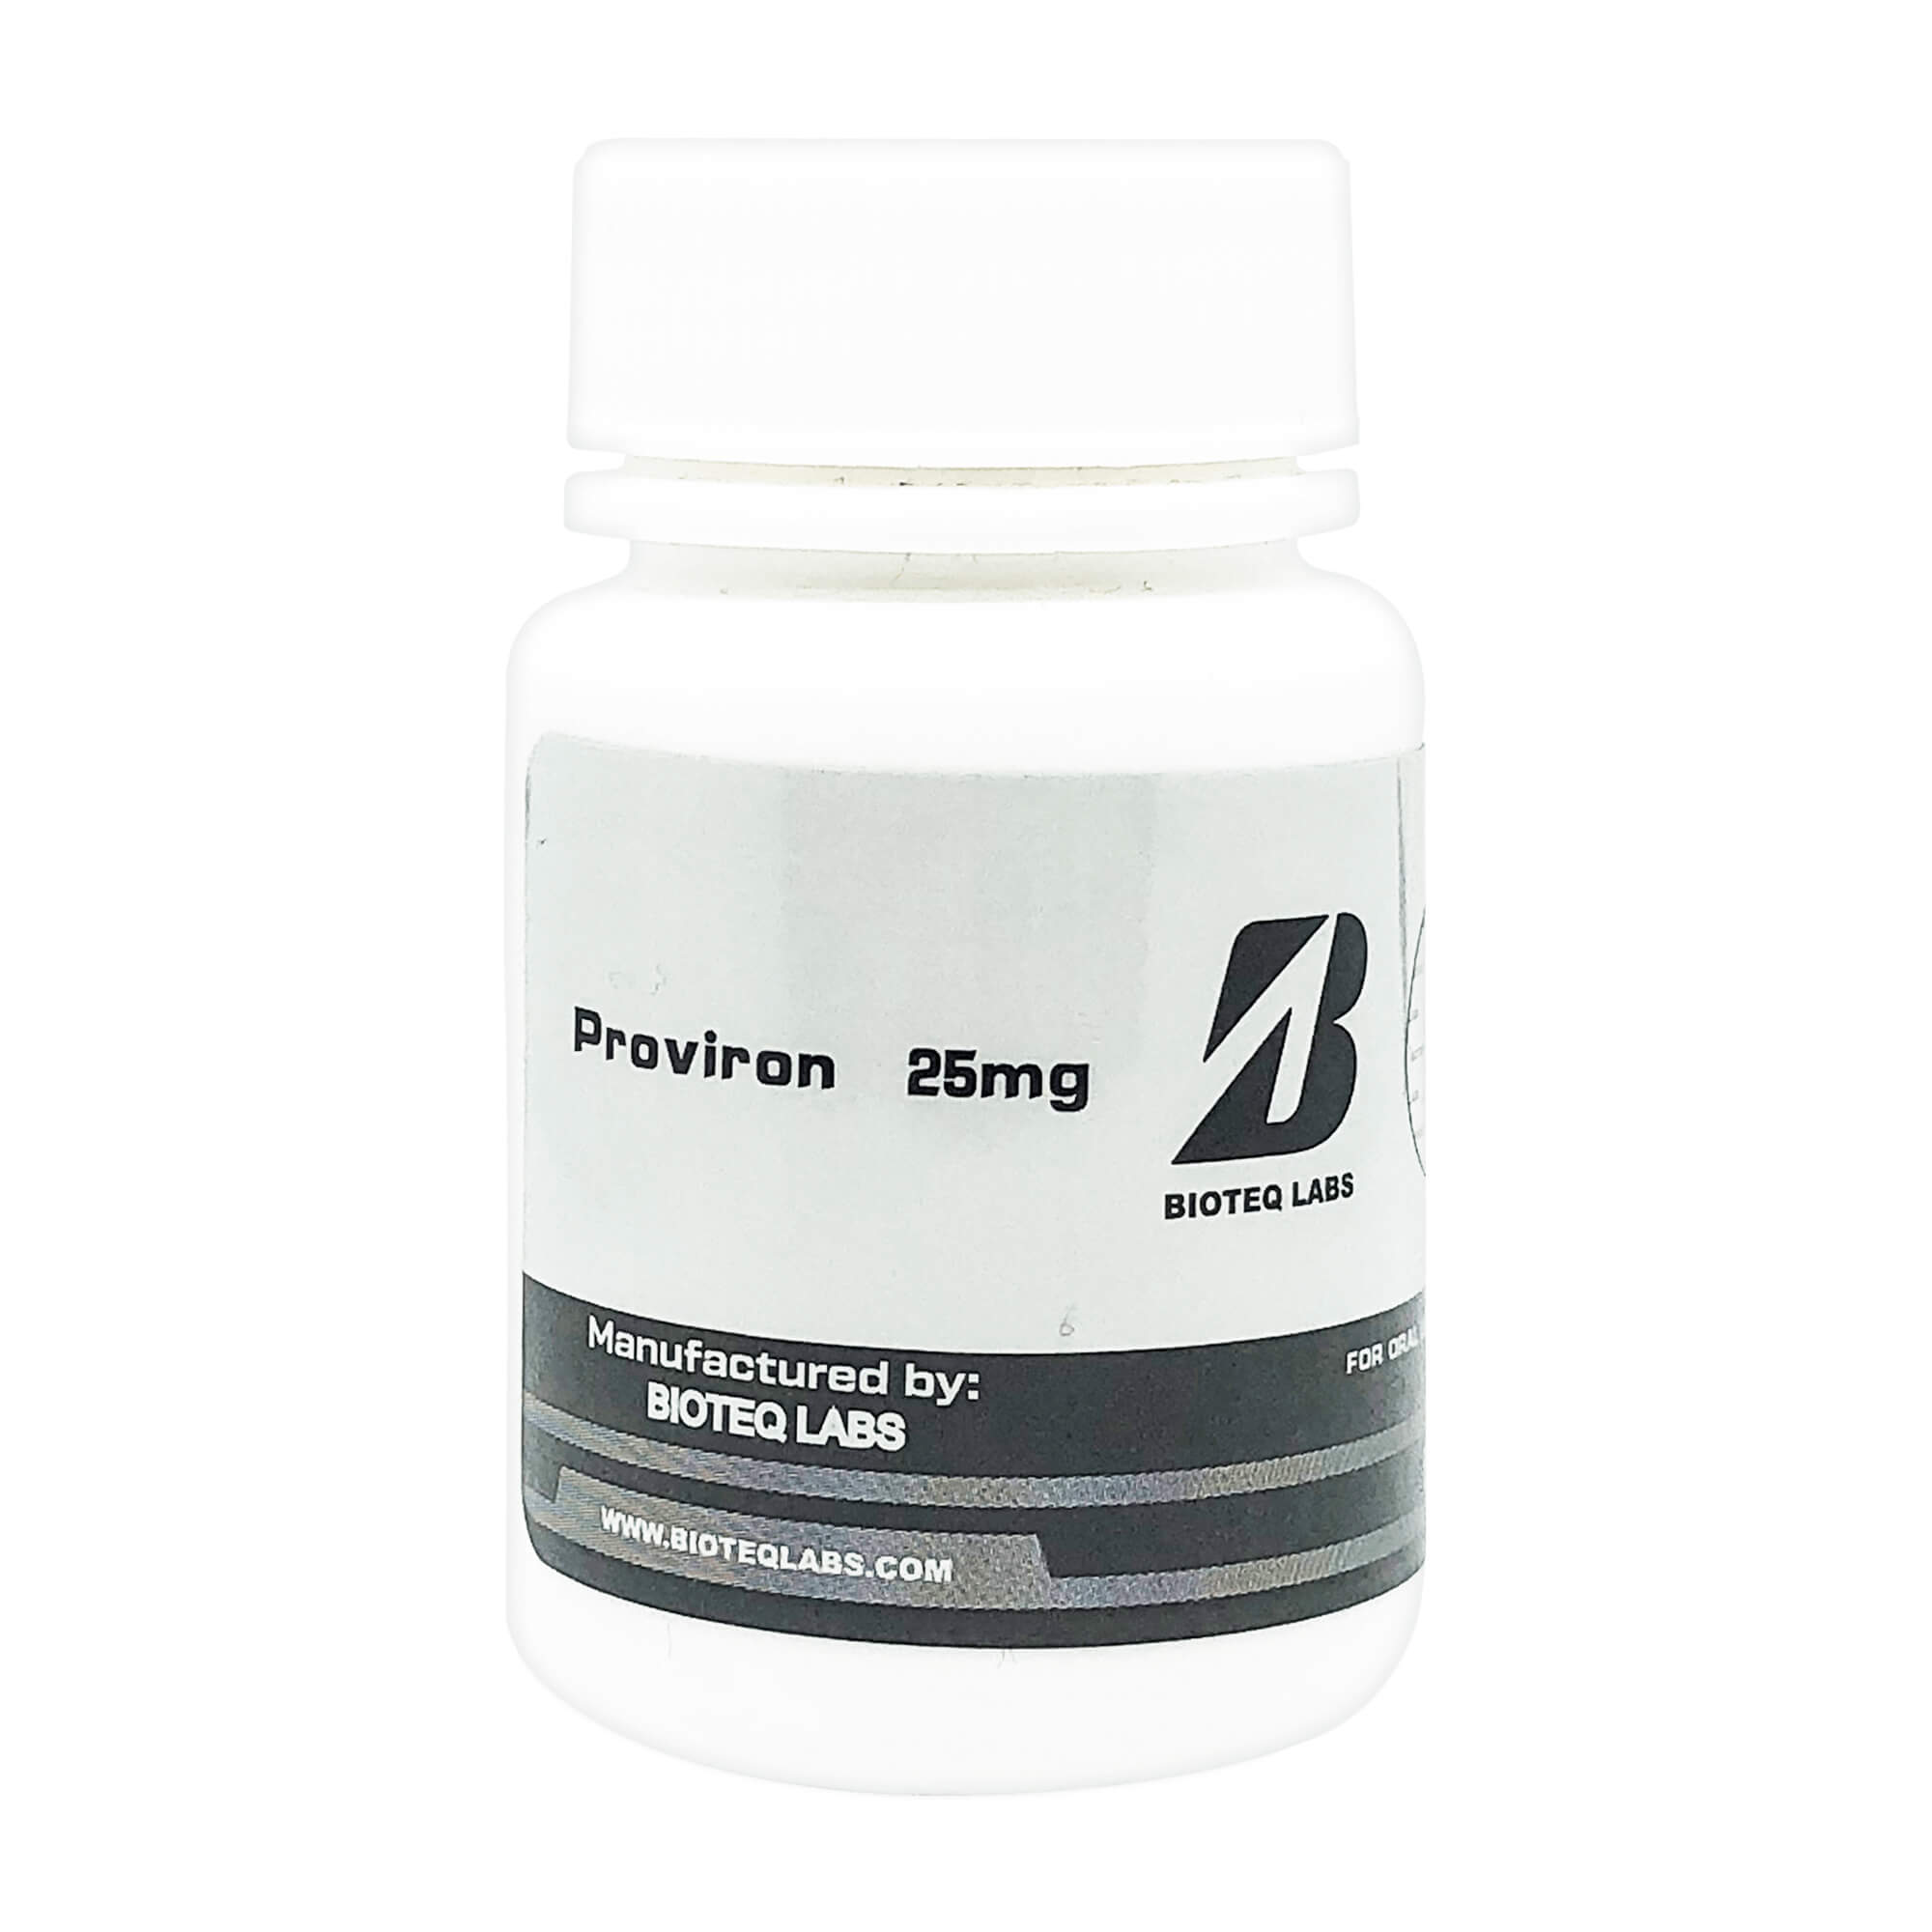 Proviron 25mg 50tabs - BioTeq Labs - LeCoqMusclé.com